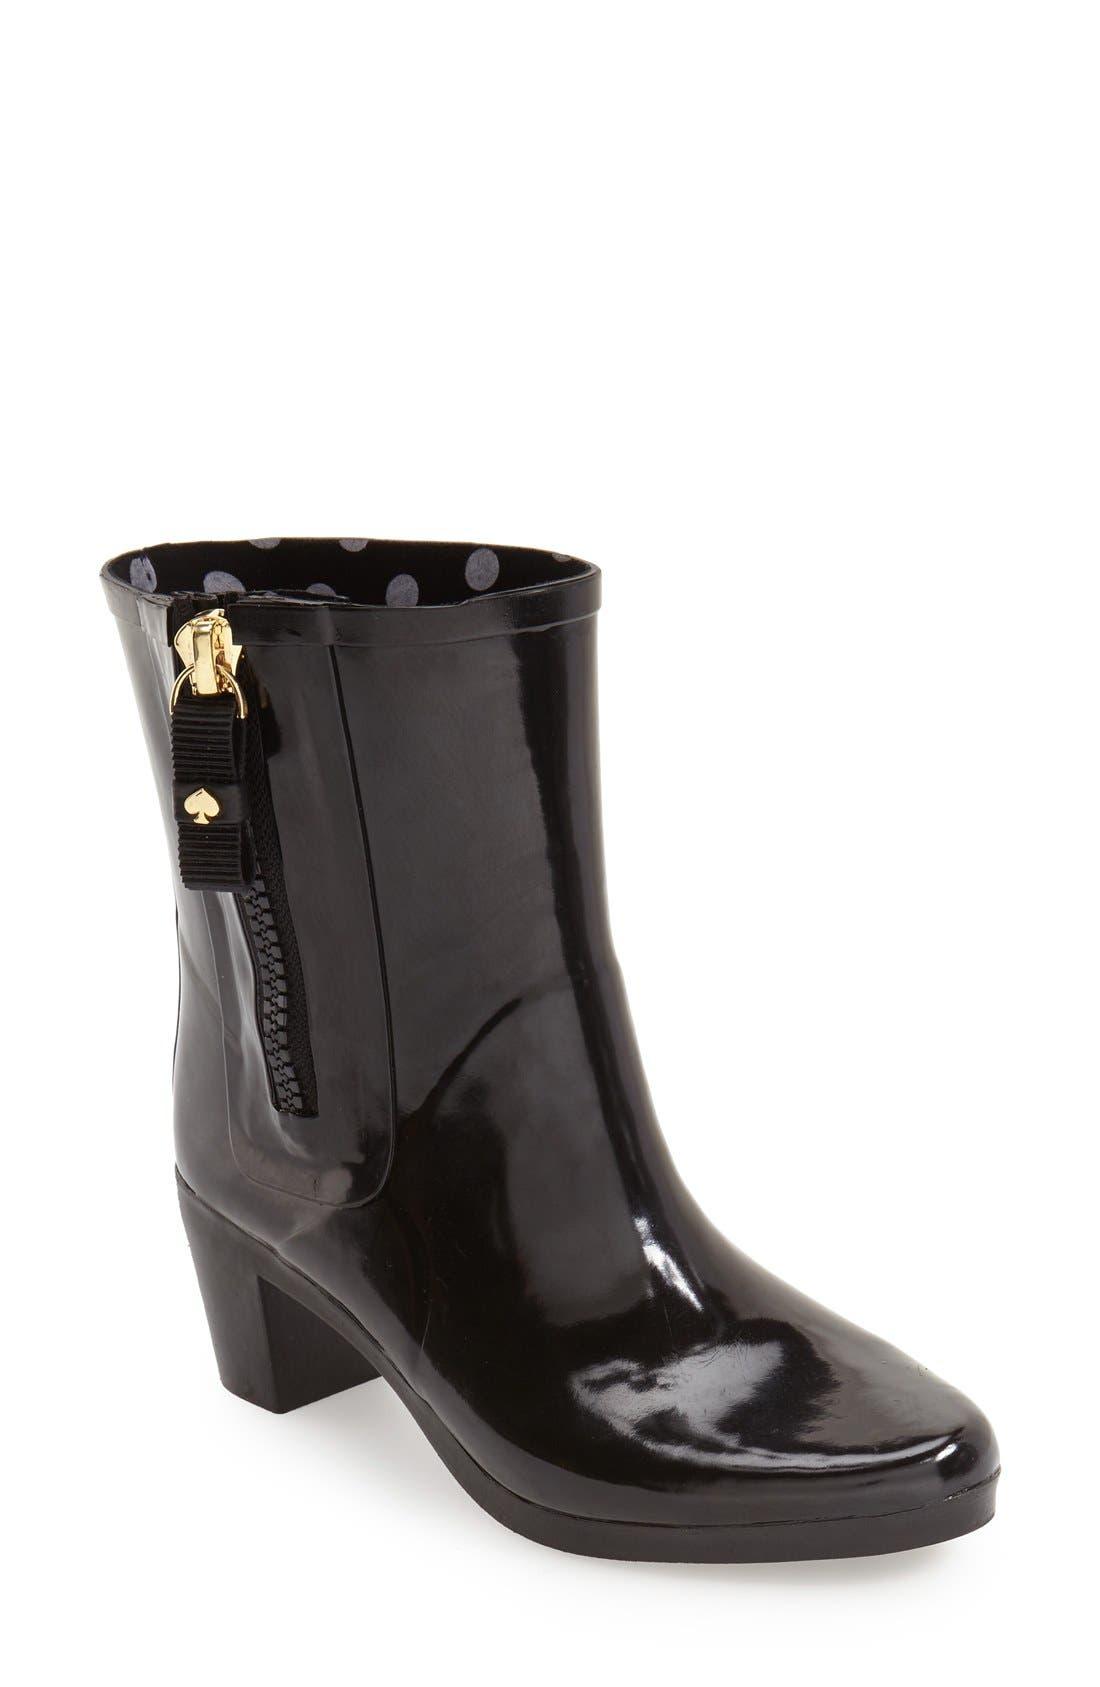 Alternate Image 1 Selected - kate spade new york 'penny' rain boot (Women)